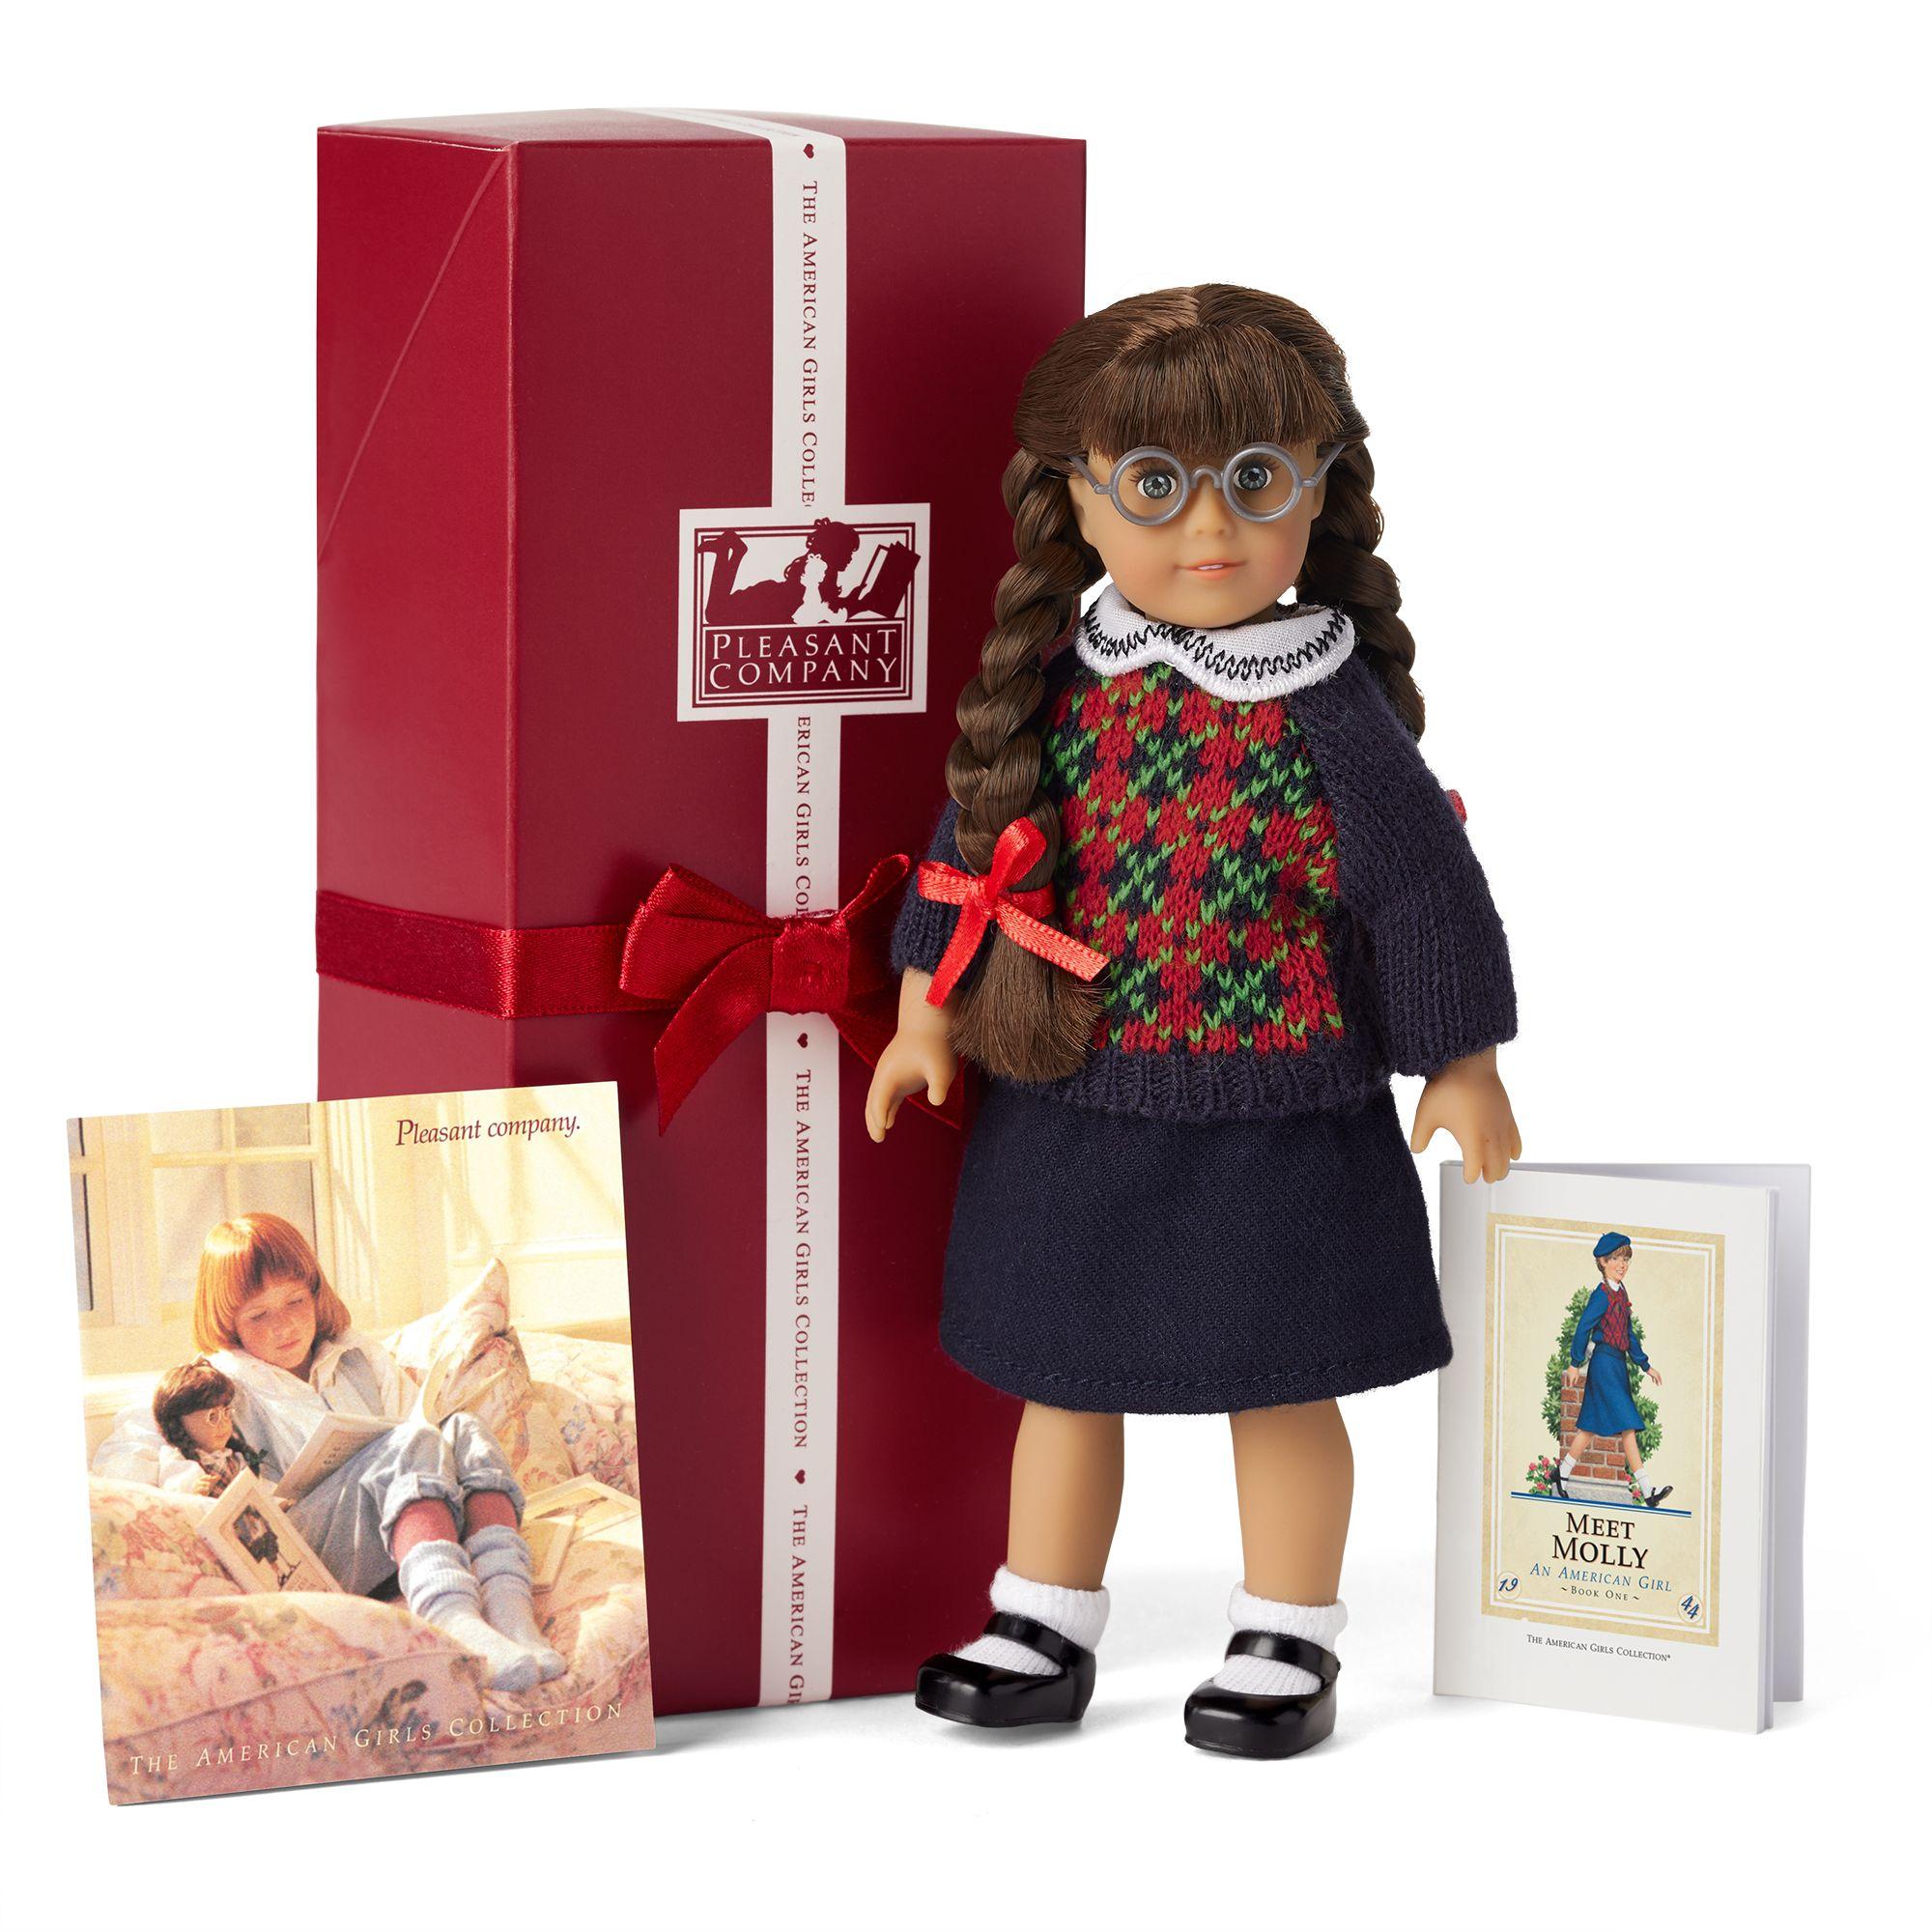 Courtney's Pleasant Company Doll